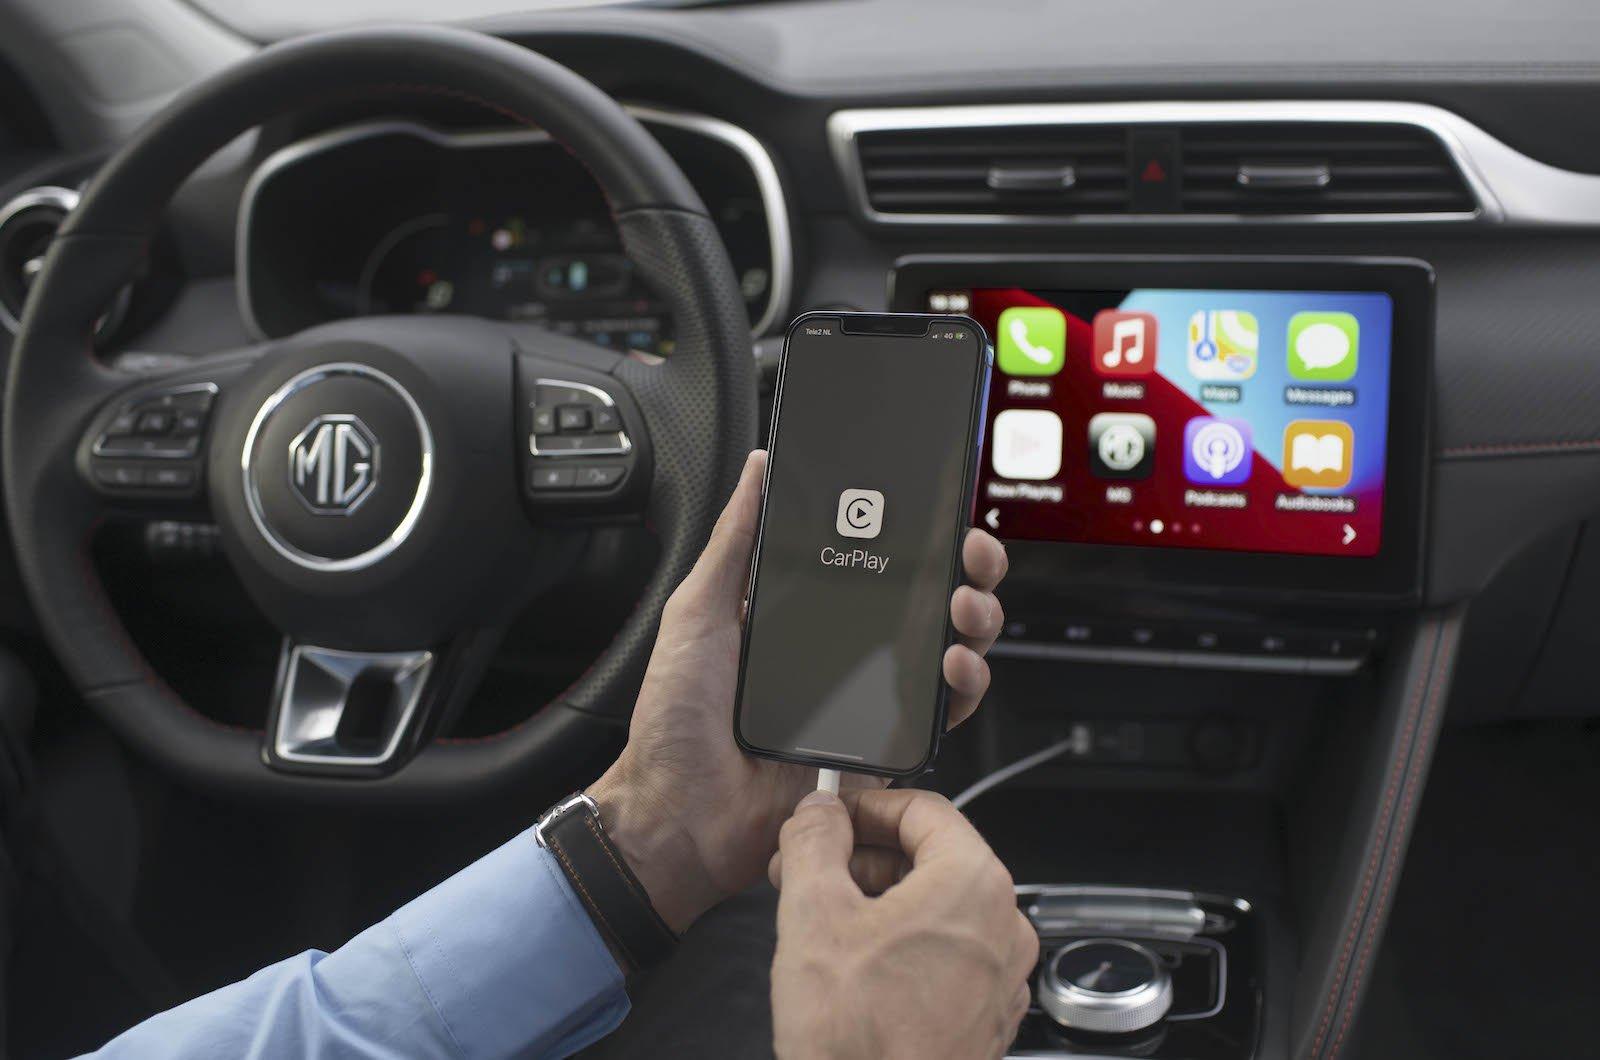 MG ZS EV 2021 interior with carplay